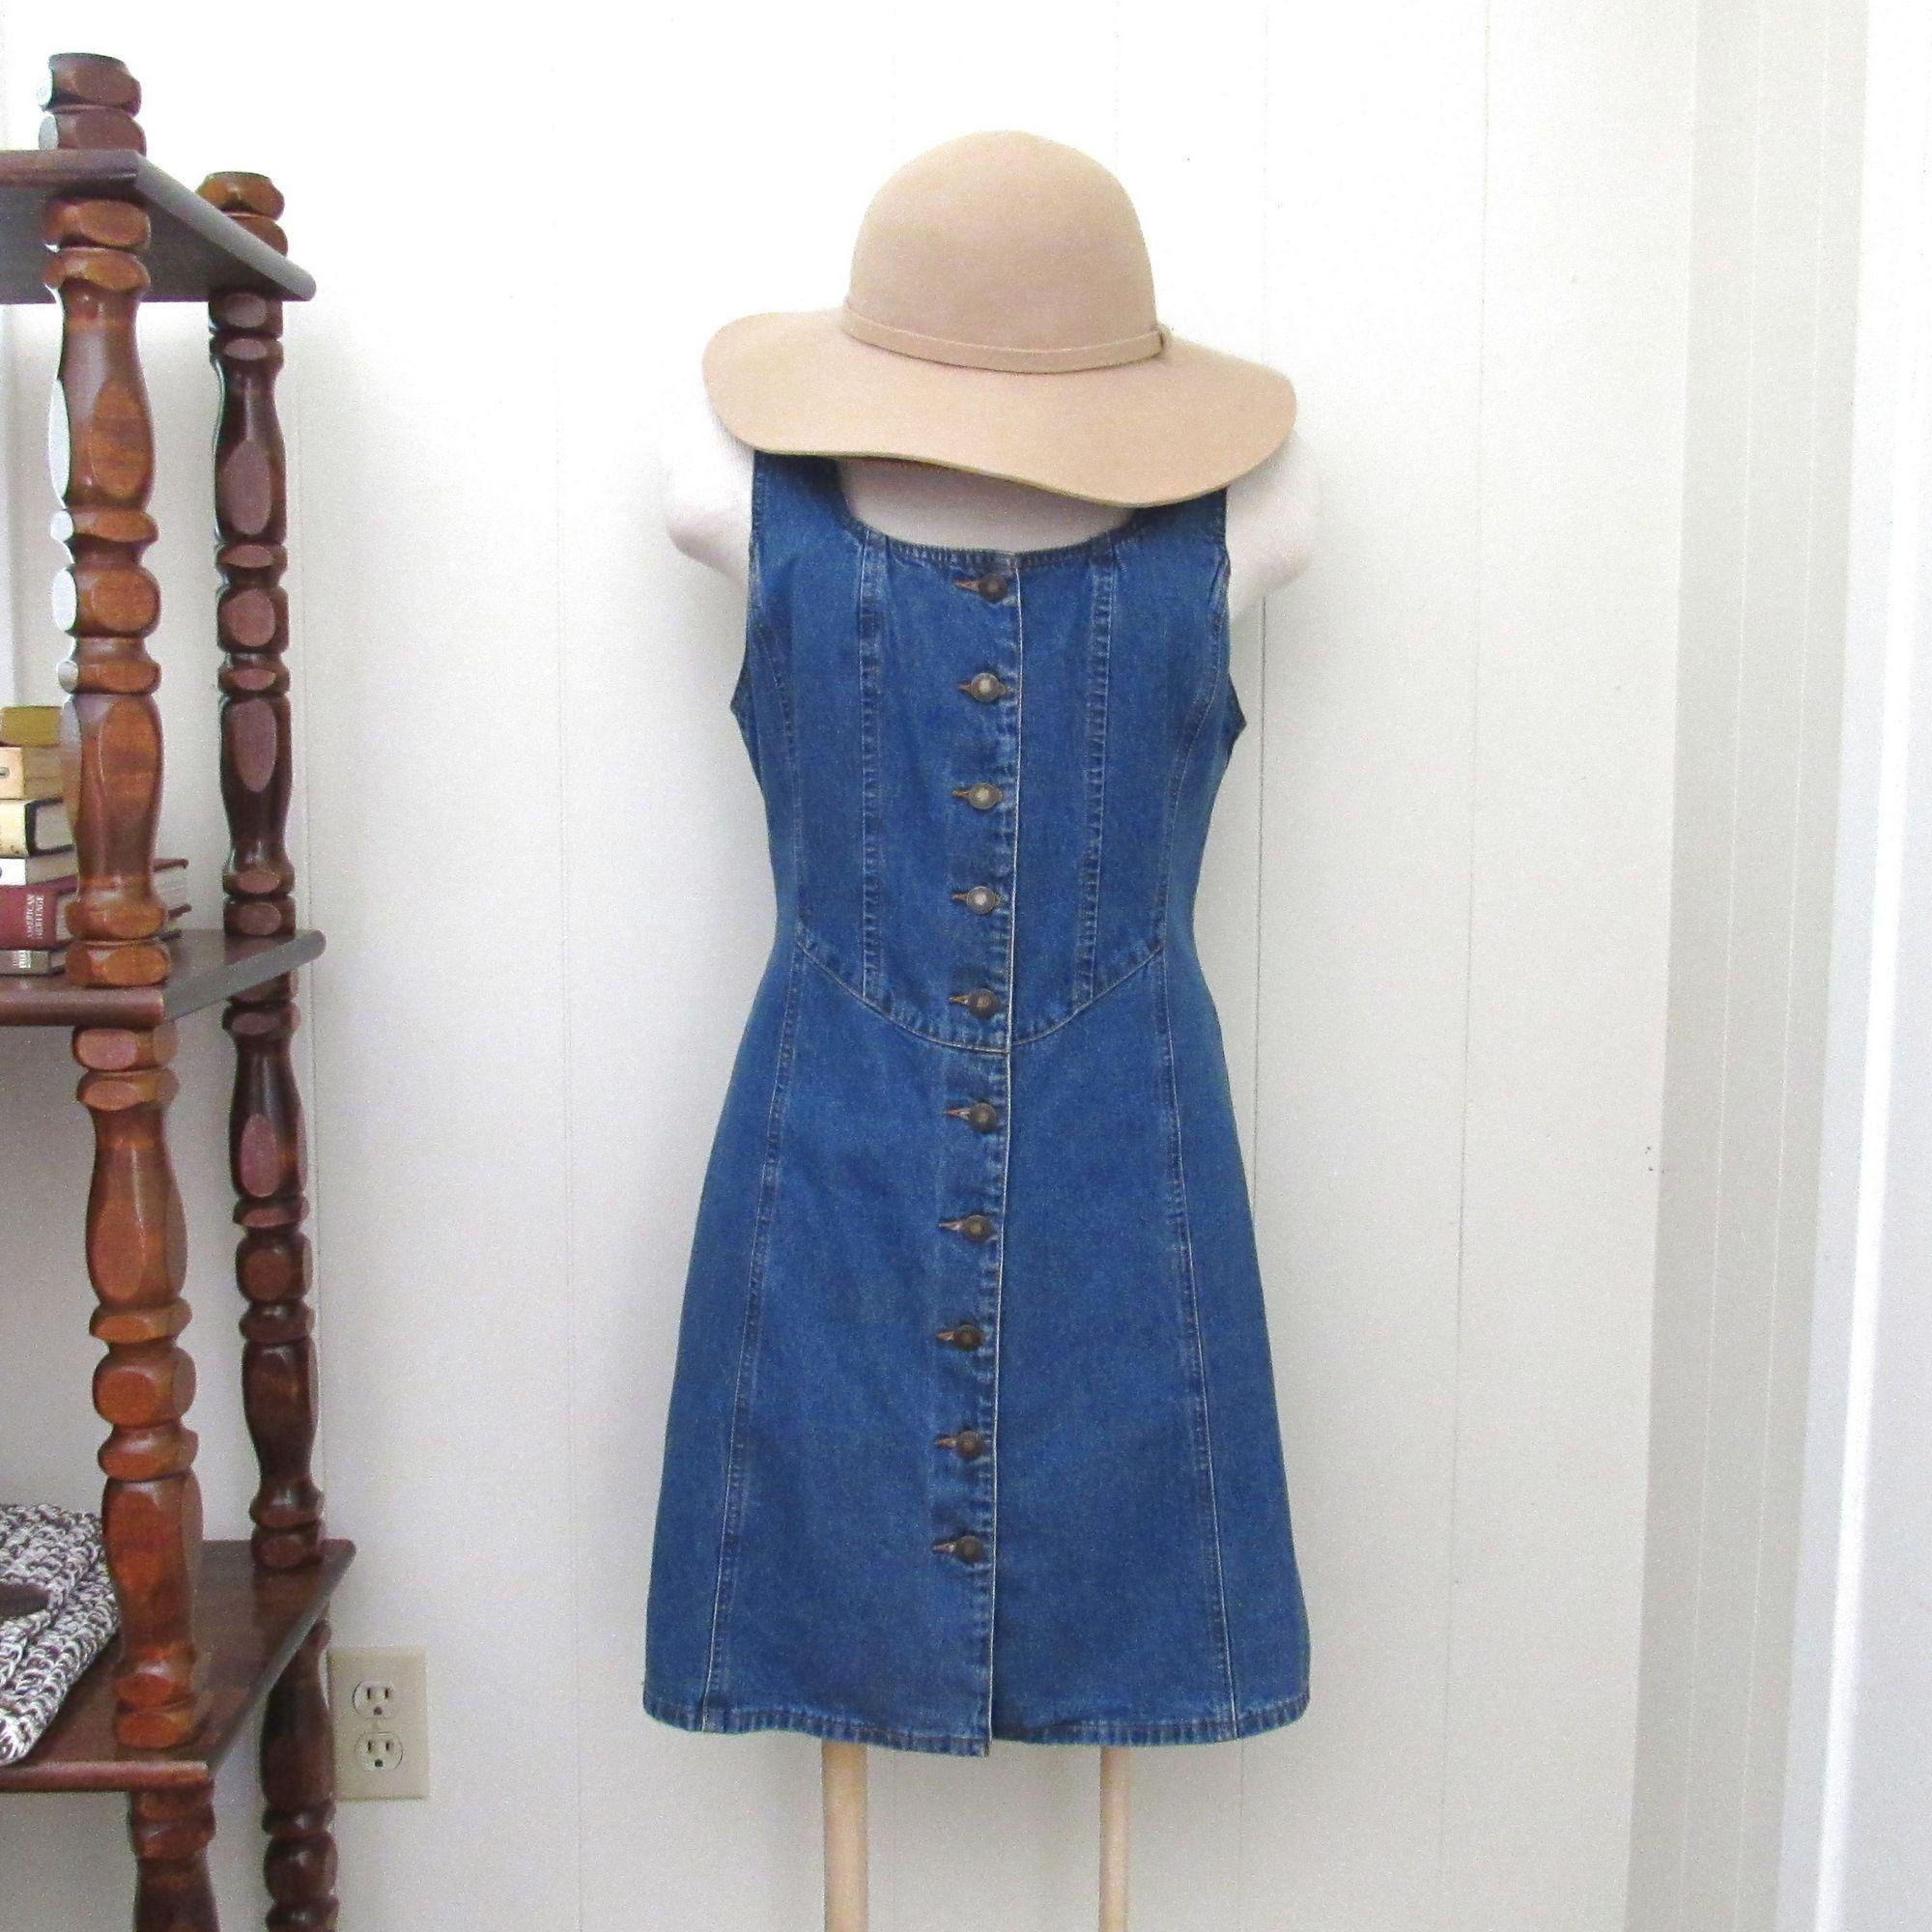 Vintage Denim Dress 90s Jean Dress Button Up Sun Dress Etsy Vintage Denim Dress Vintage Denim Jeans Dress